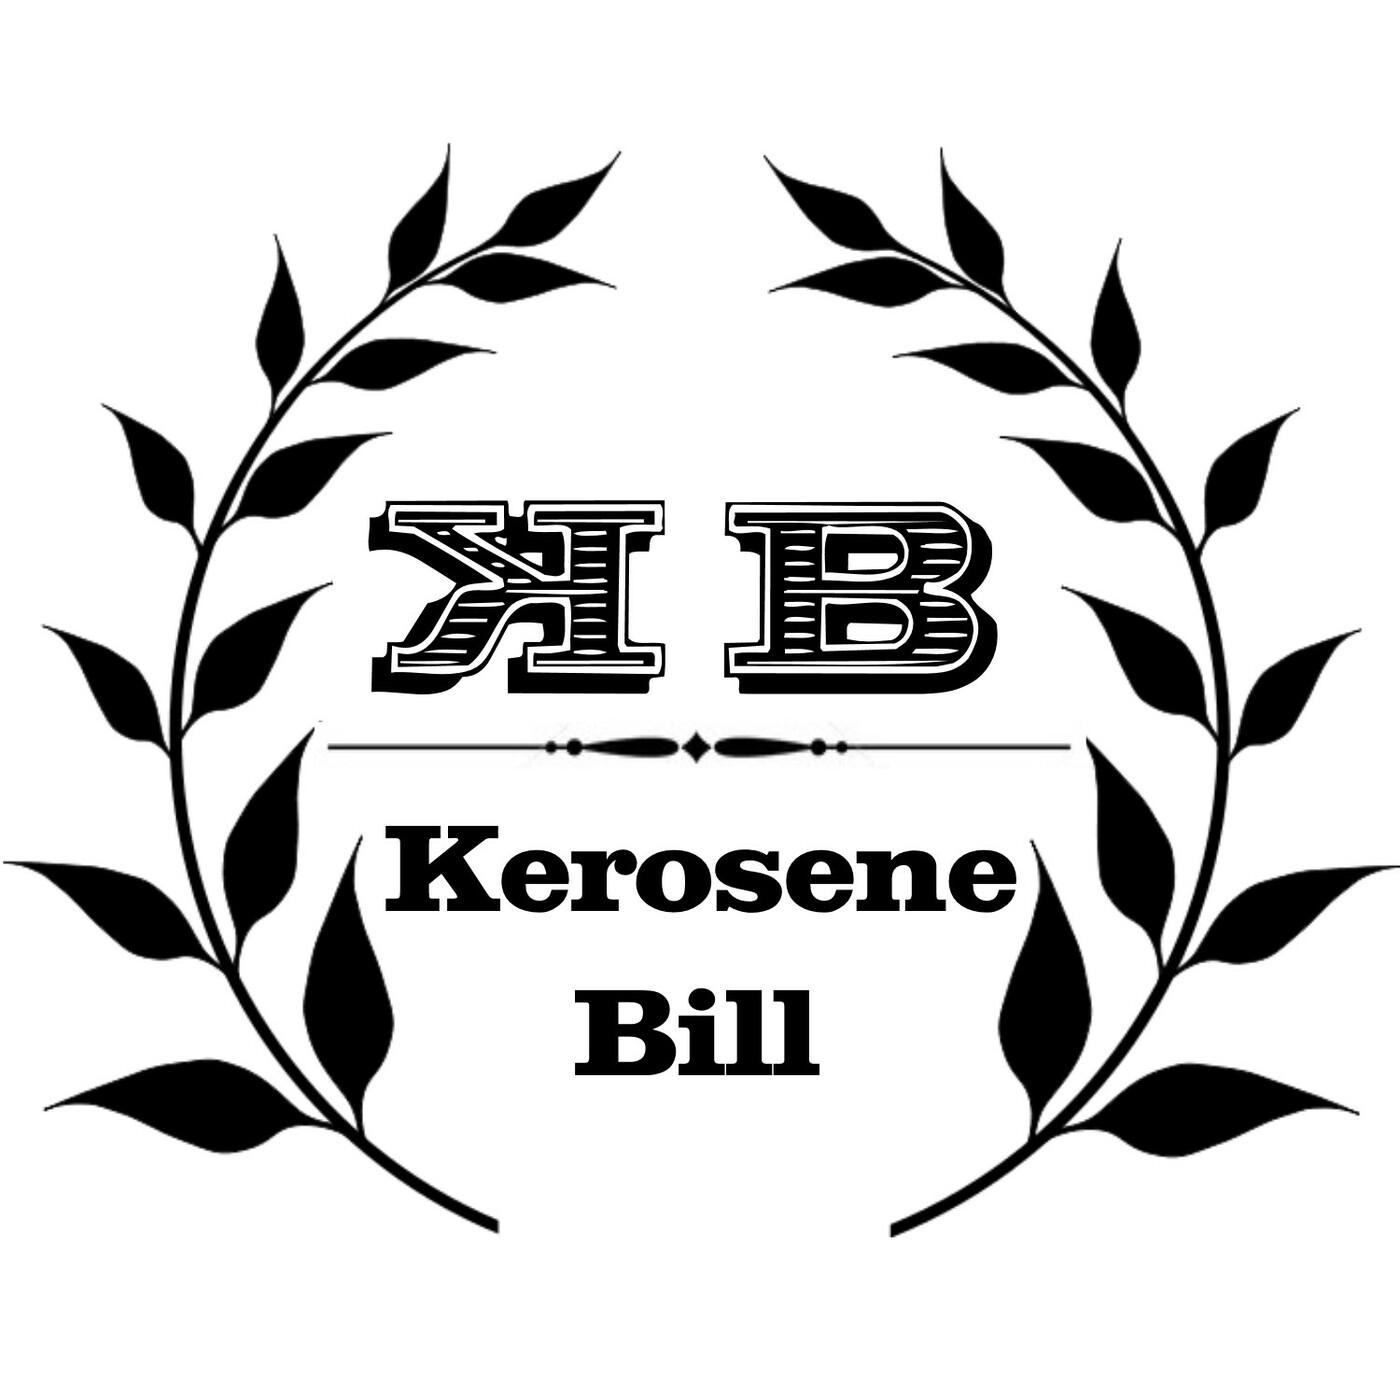 Kerosene Bill